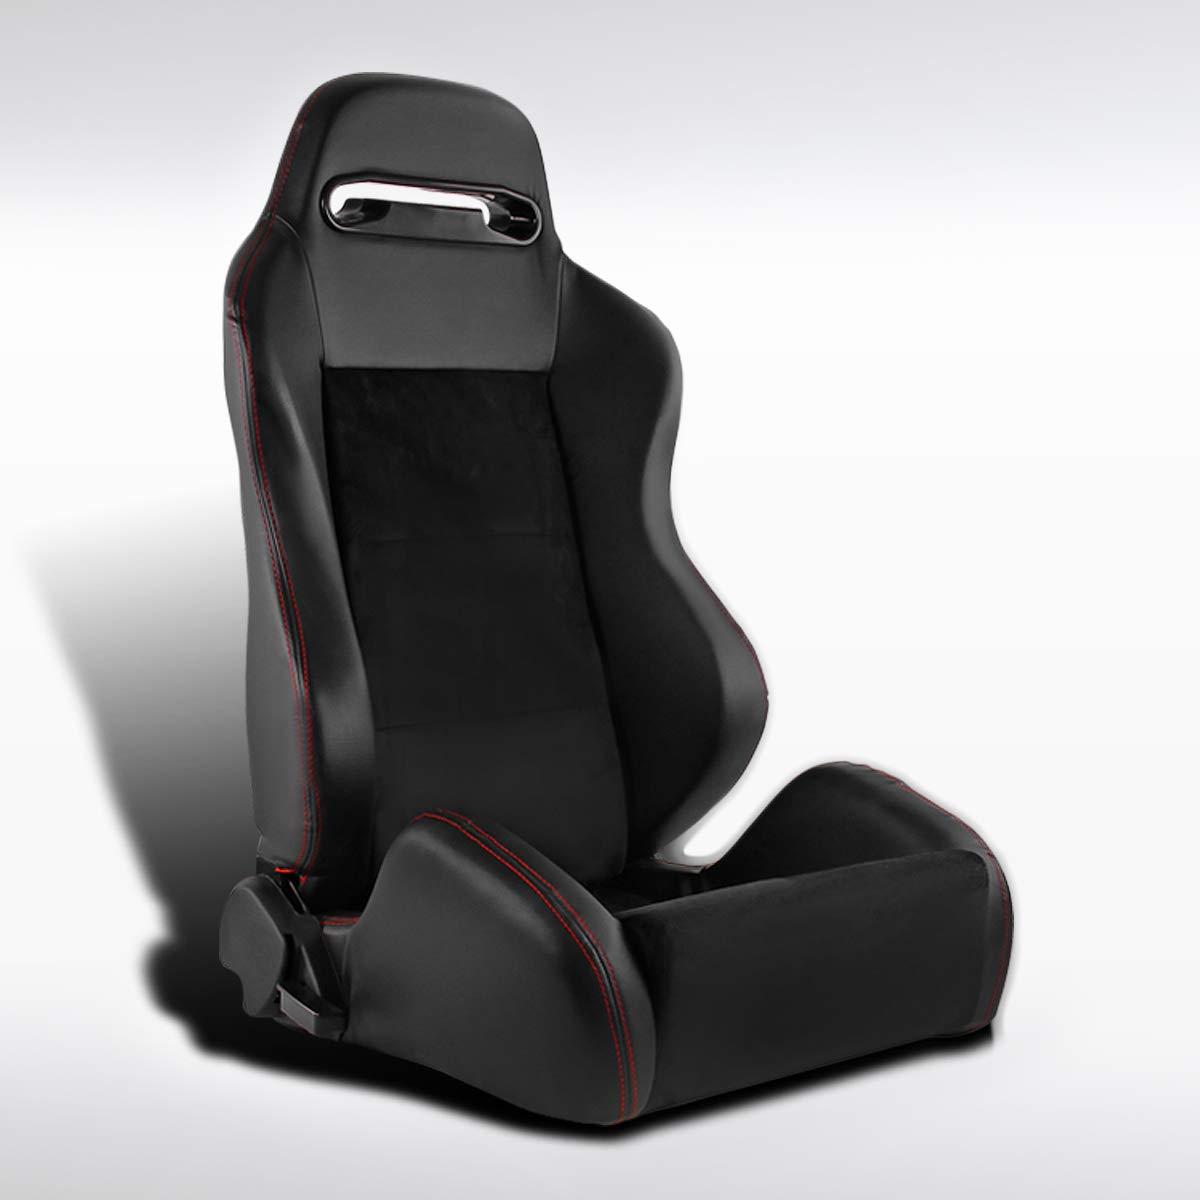 Autozensation Right Passenger Reclining Sport Racing Seat PVC Leather Black//Red Cloth W//Slider